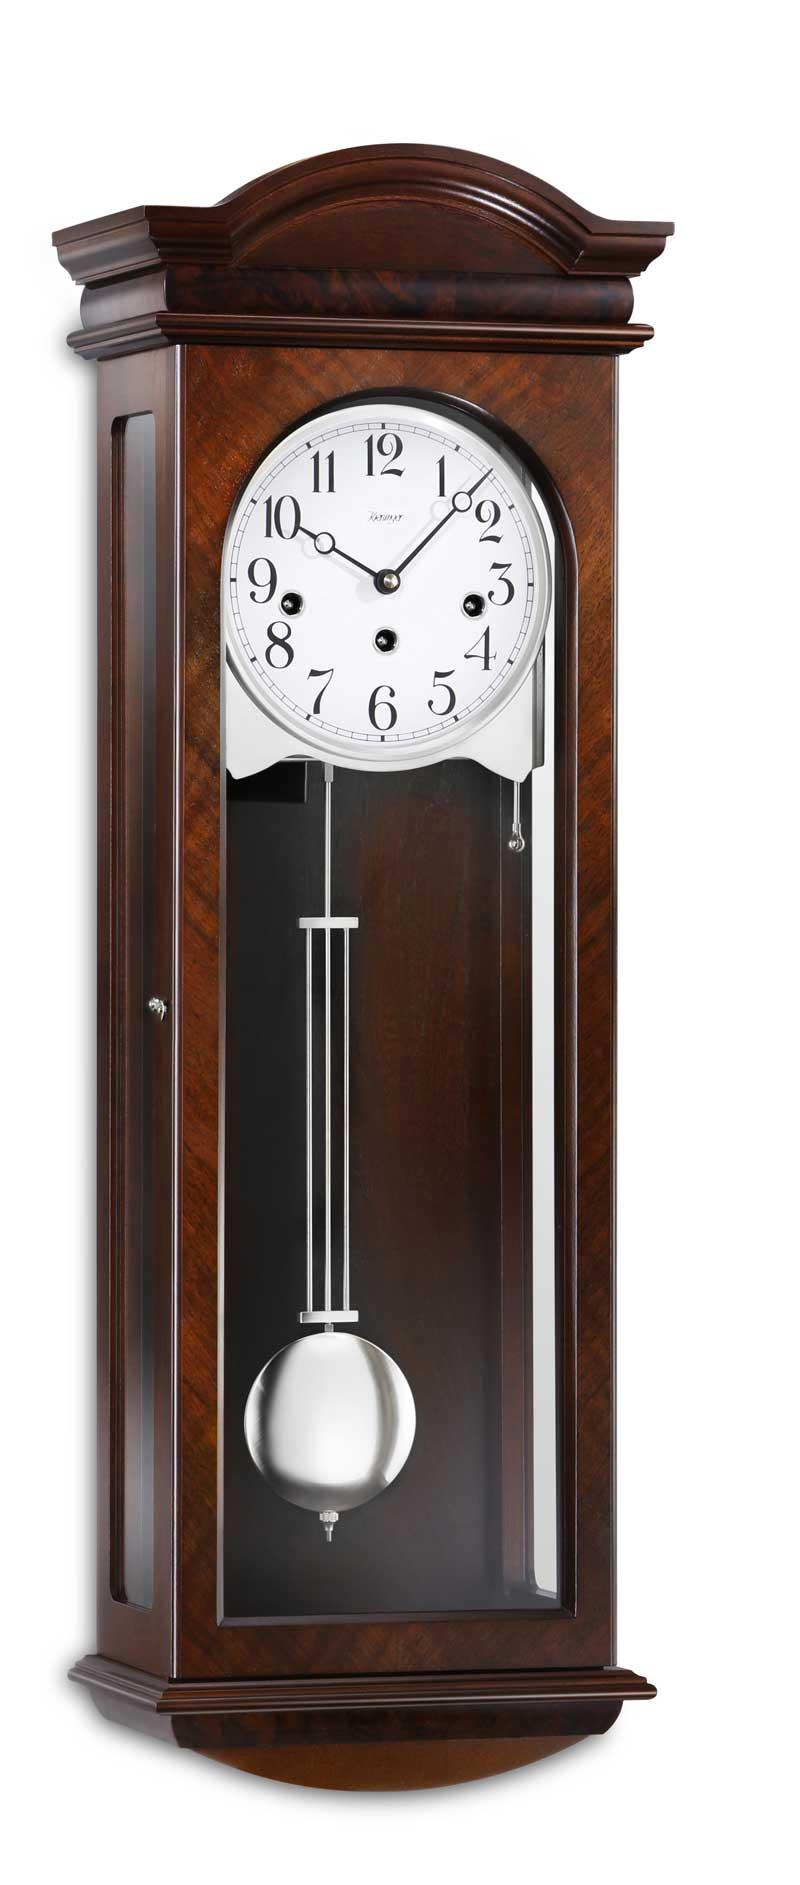 Kieninger uhrenshop kieninger classic walnut wall clock kieninger uhrenshop kieninger classic walnut wall clock westminster 5 rod gong 2633 22 01 amipublicfo Images